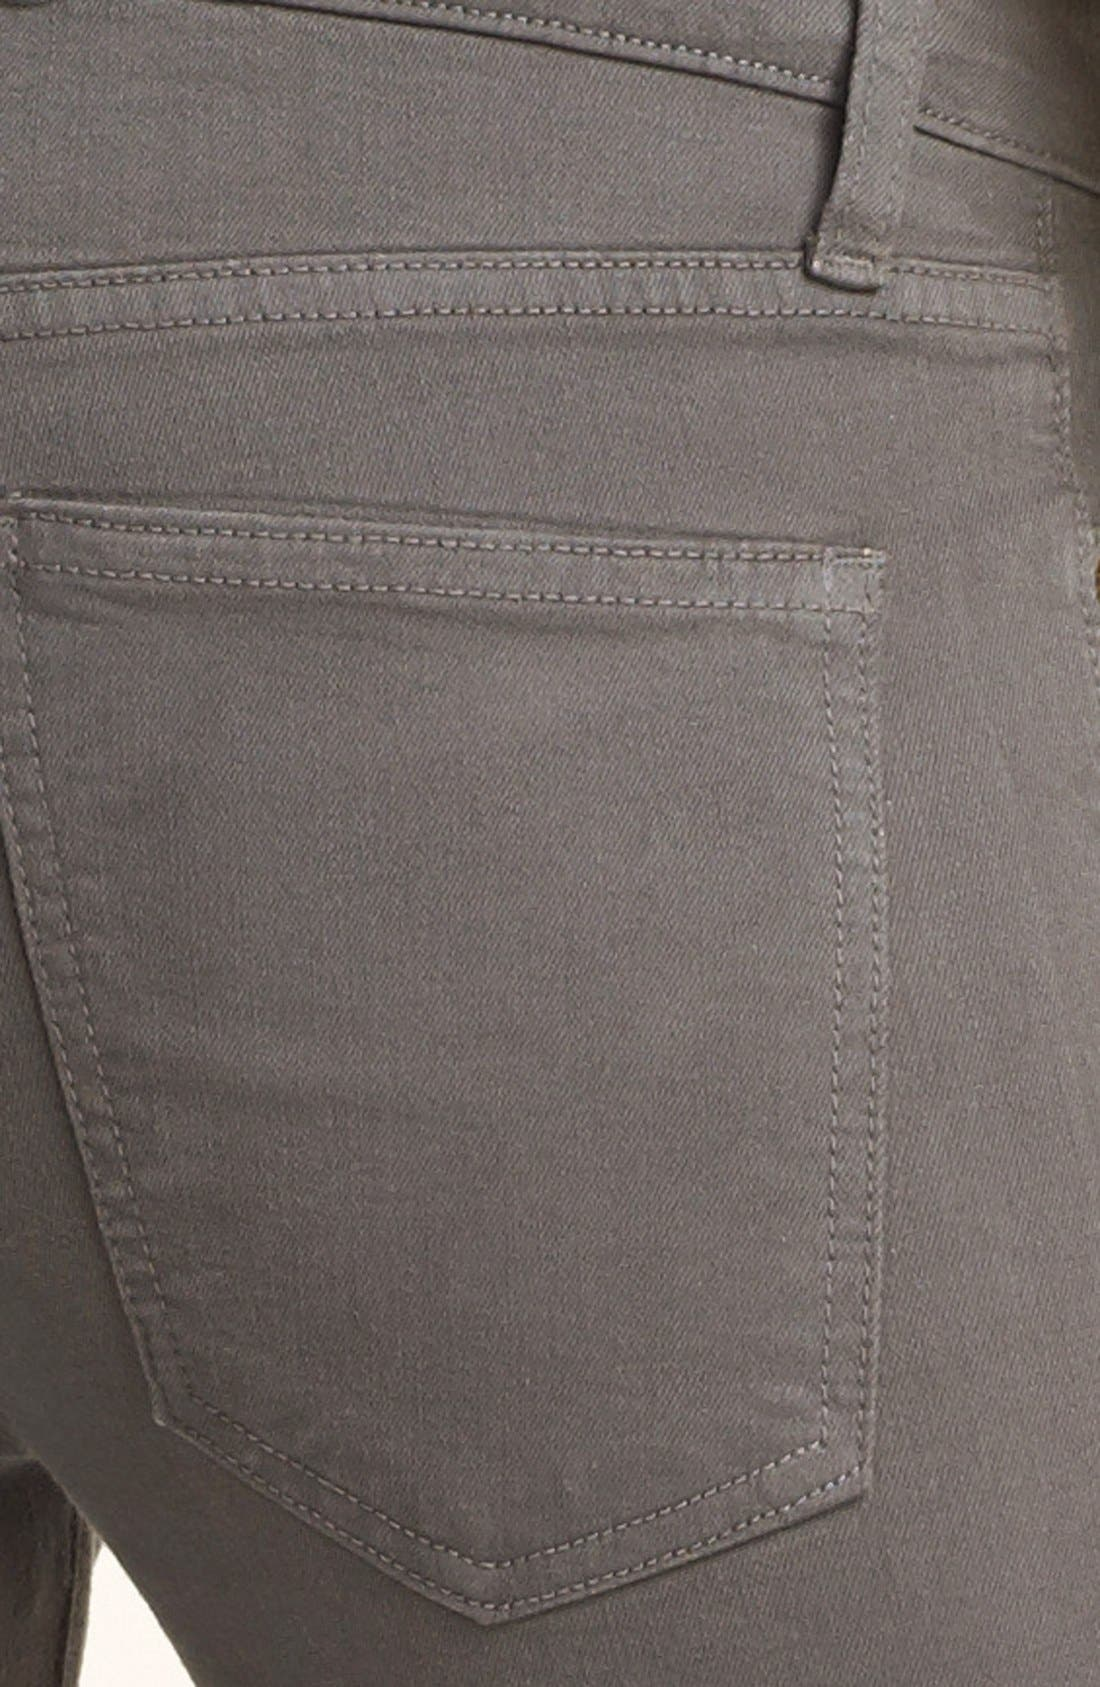 Alternate Image 3  - Current/Elliott 'The Stiletto' Coated Stretch Jeans (Ombré Coated Dark Castle)